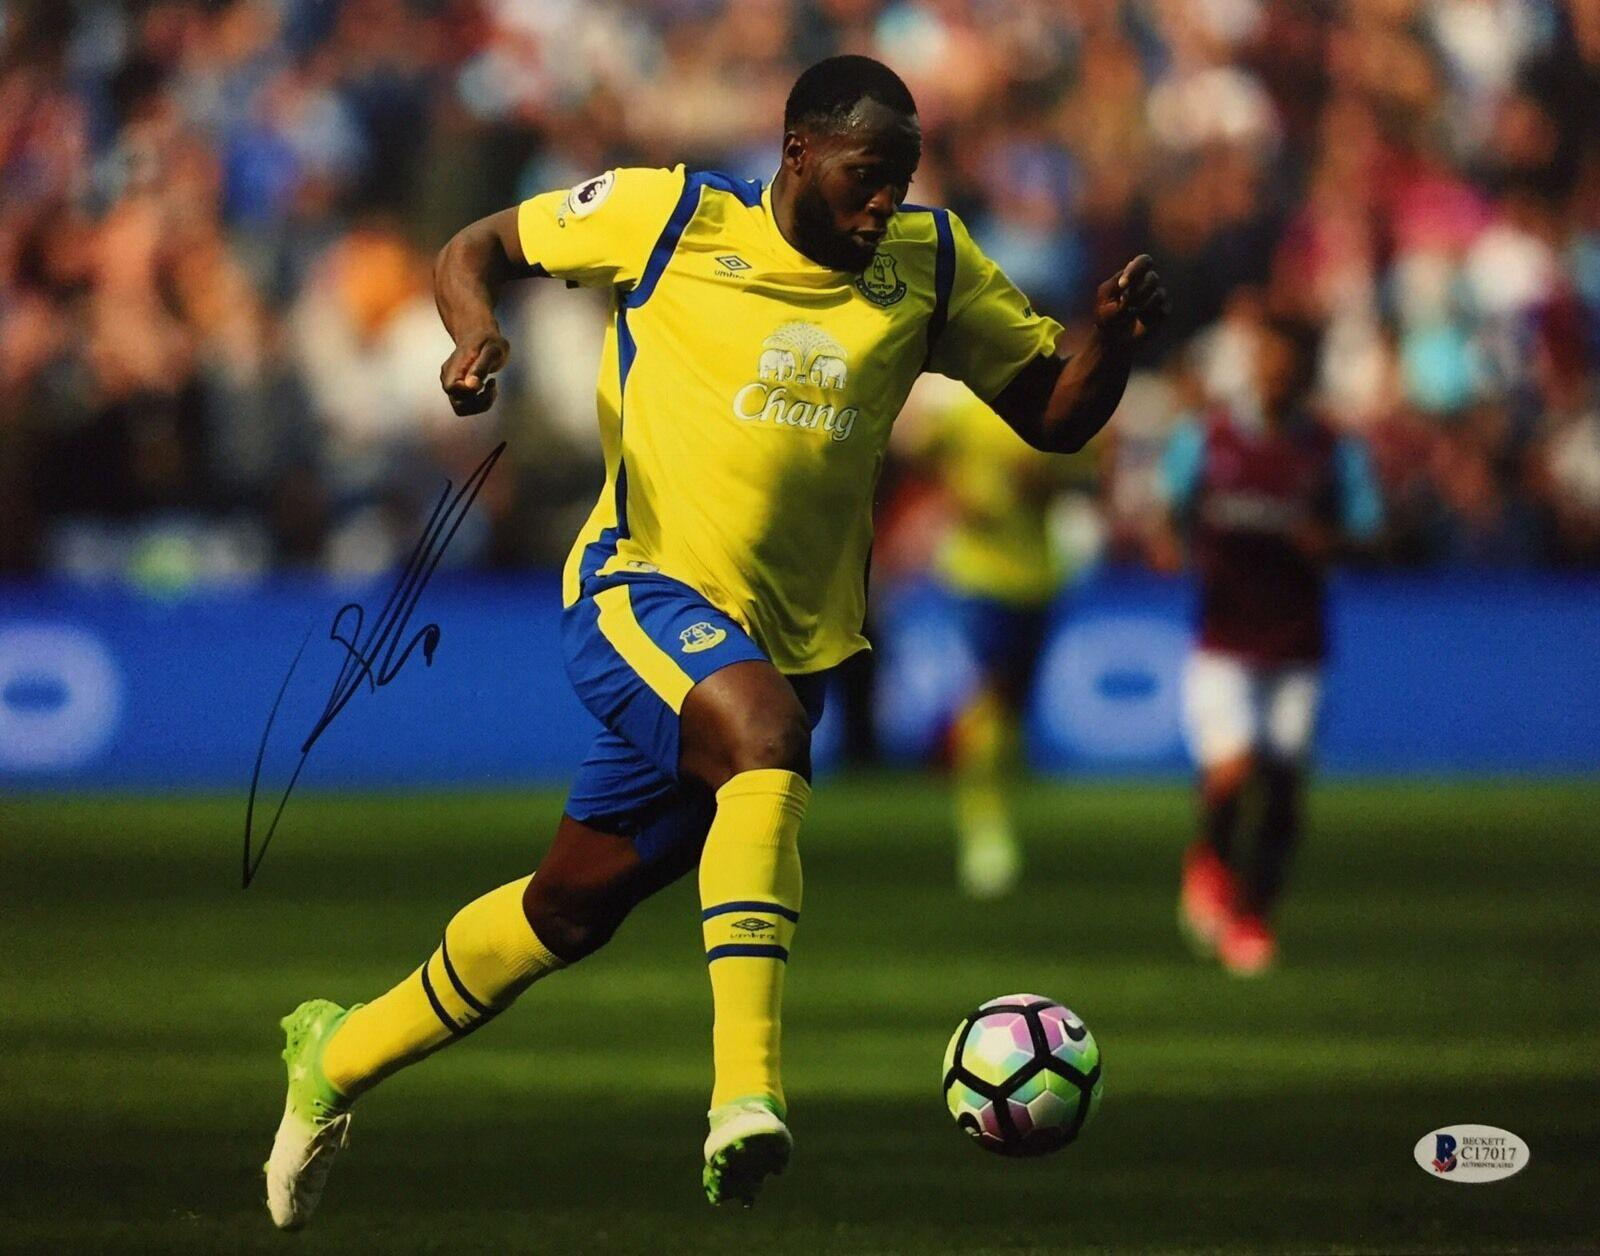 Romelu Lakaku Signed Soccer 11x14 Photo *Belgium *Manchester United BAS C17017